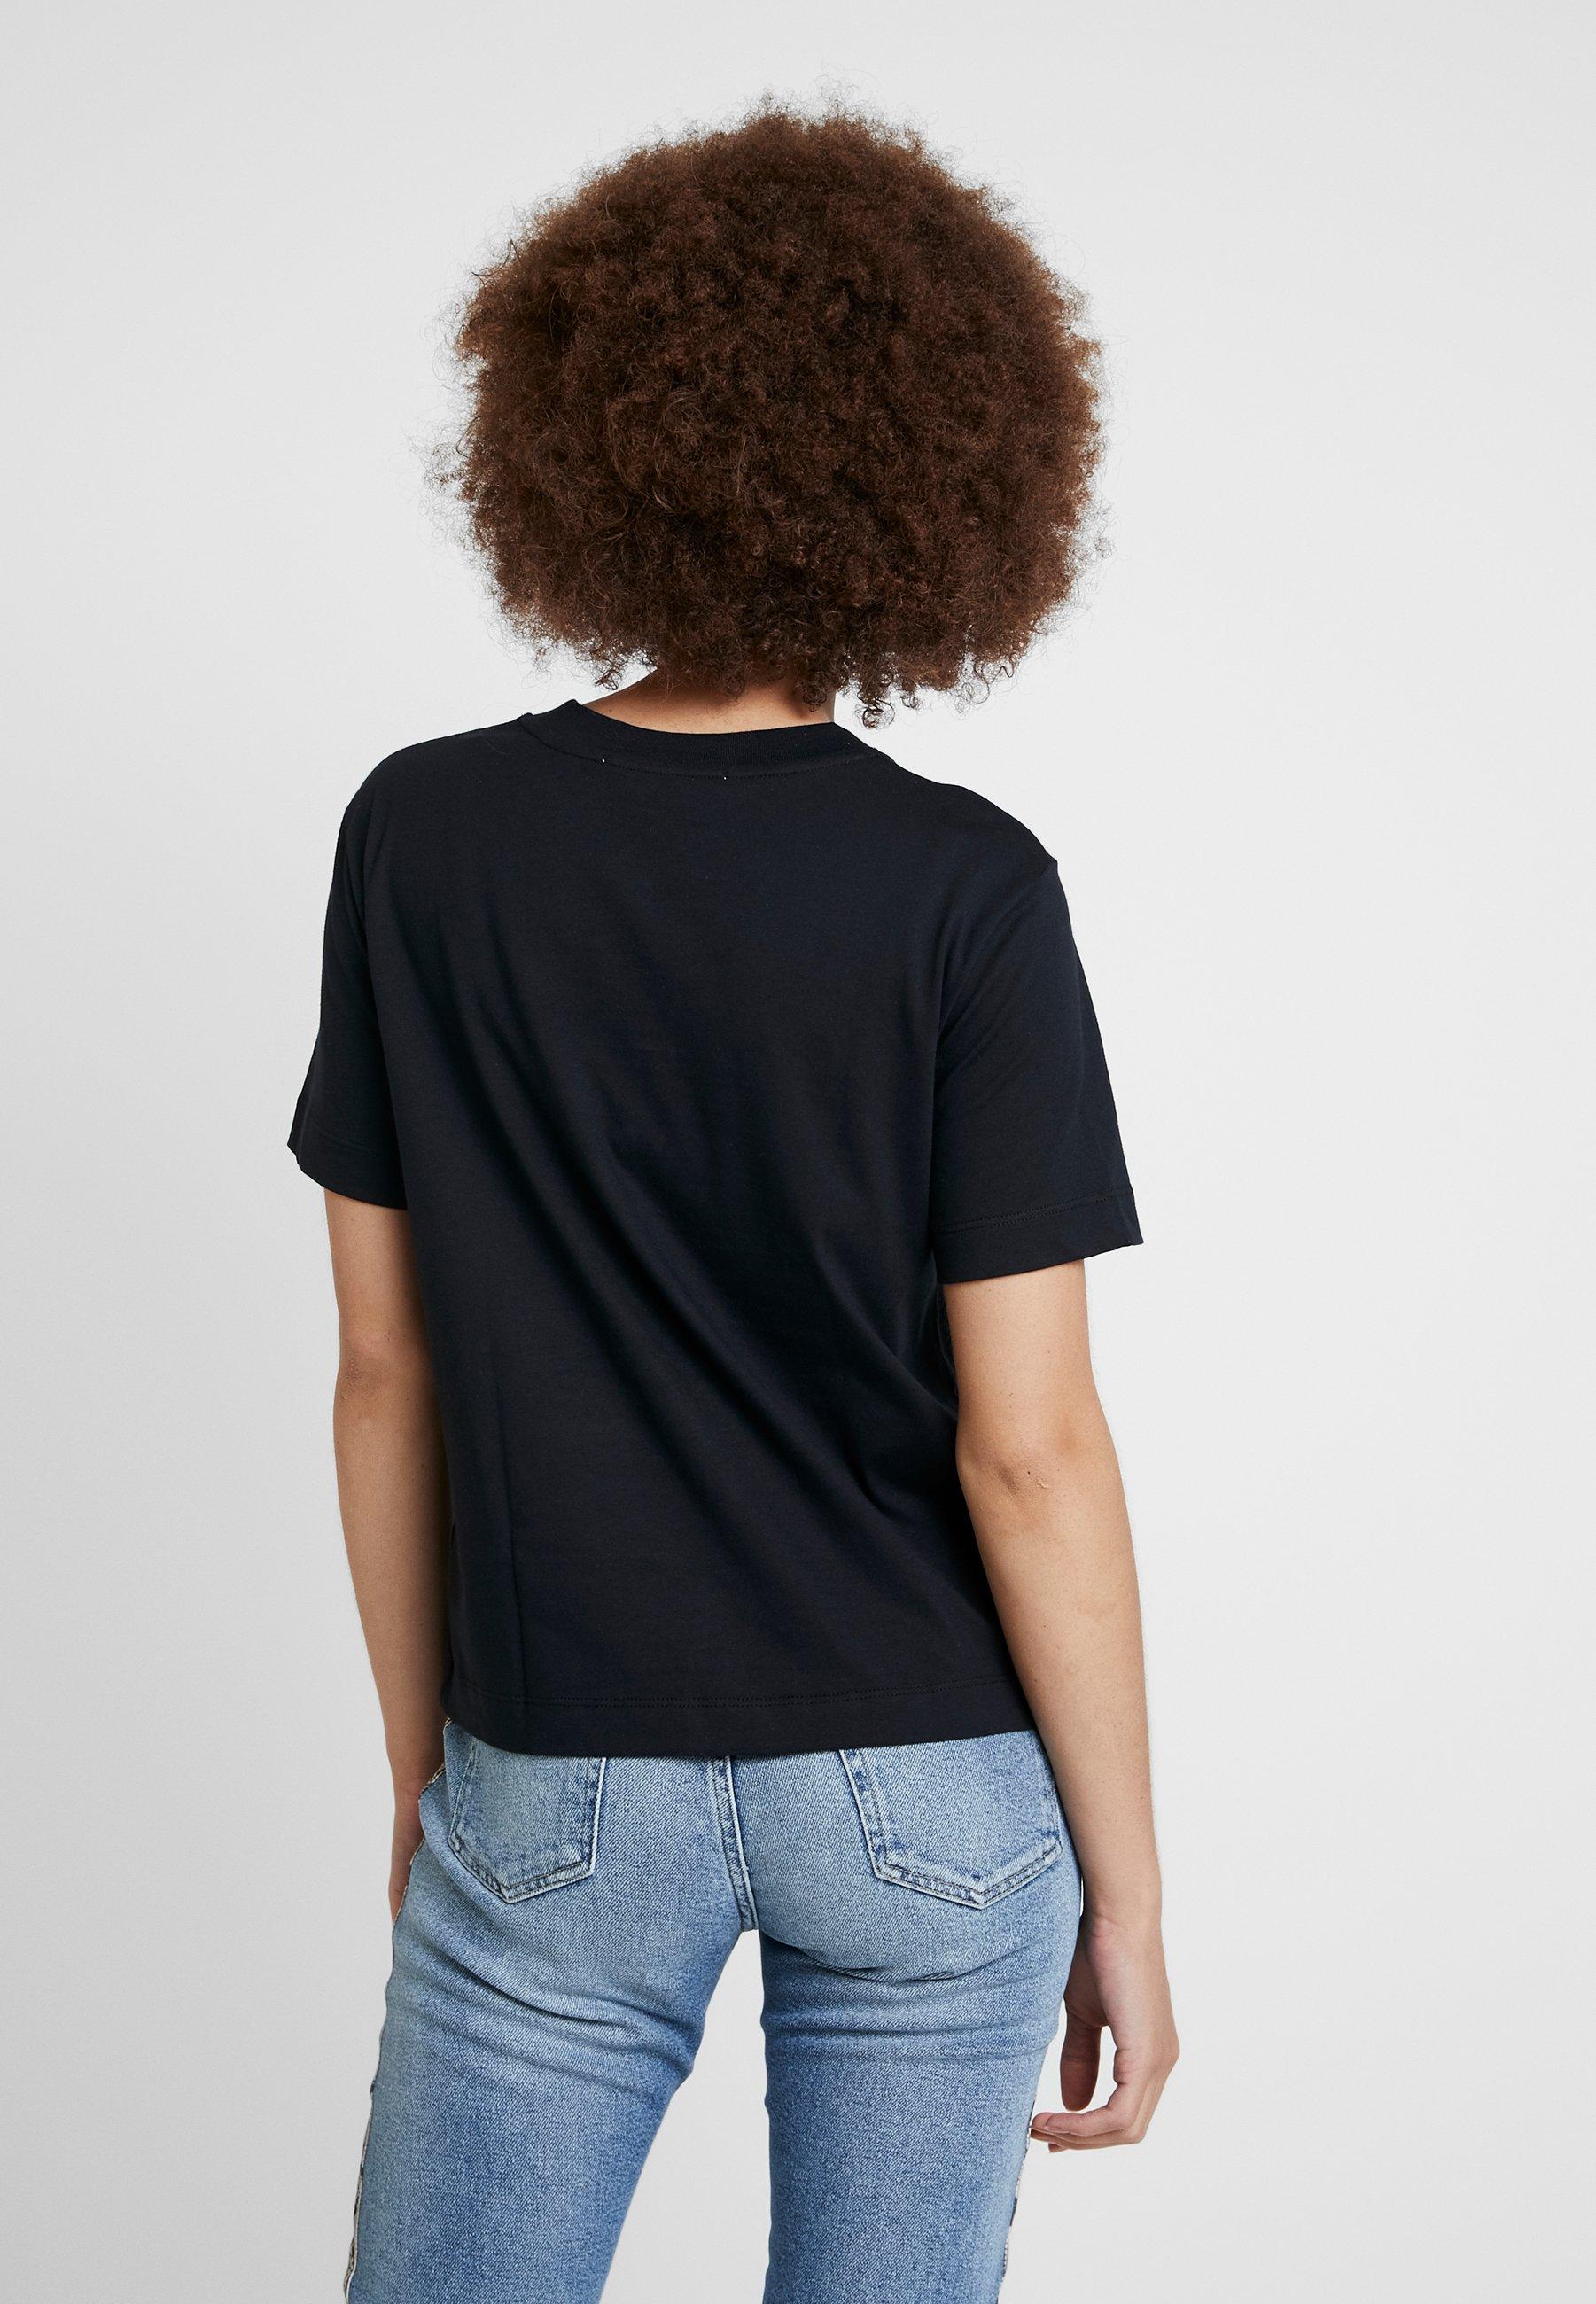 shirt StraightT Black Box Klein Calvin Imprimé Shiny Jeans rxthdsQC